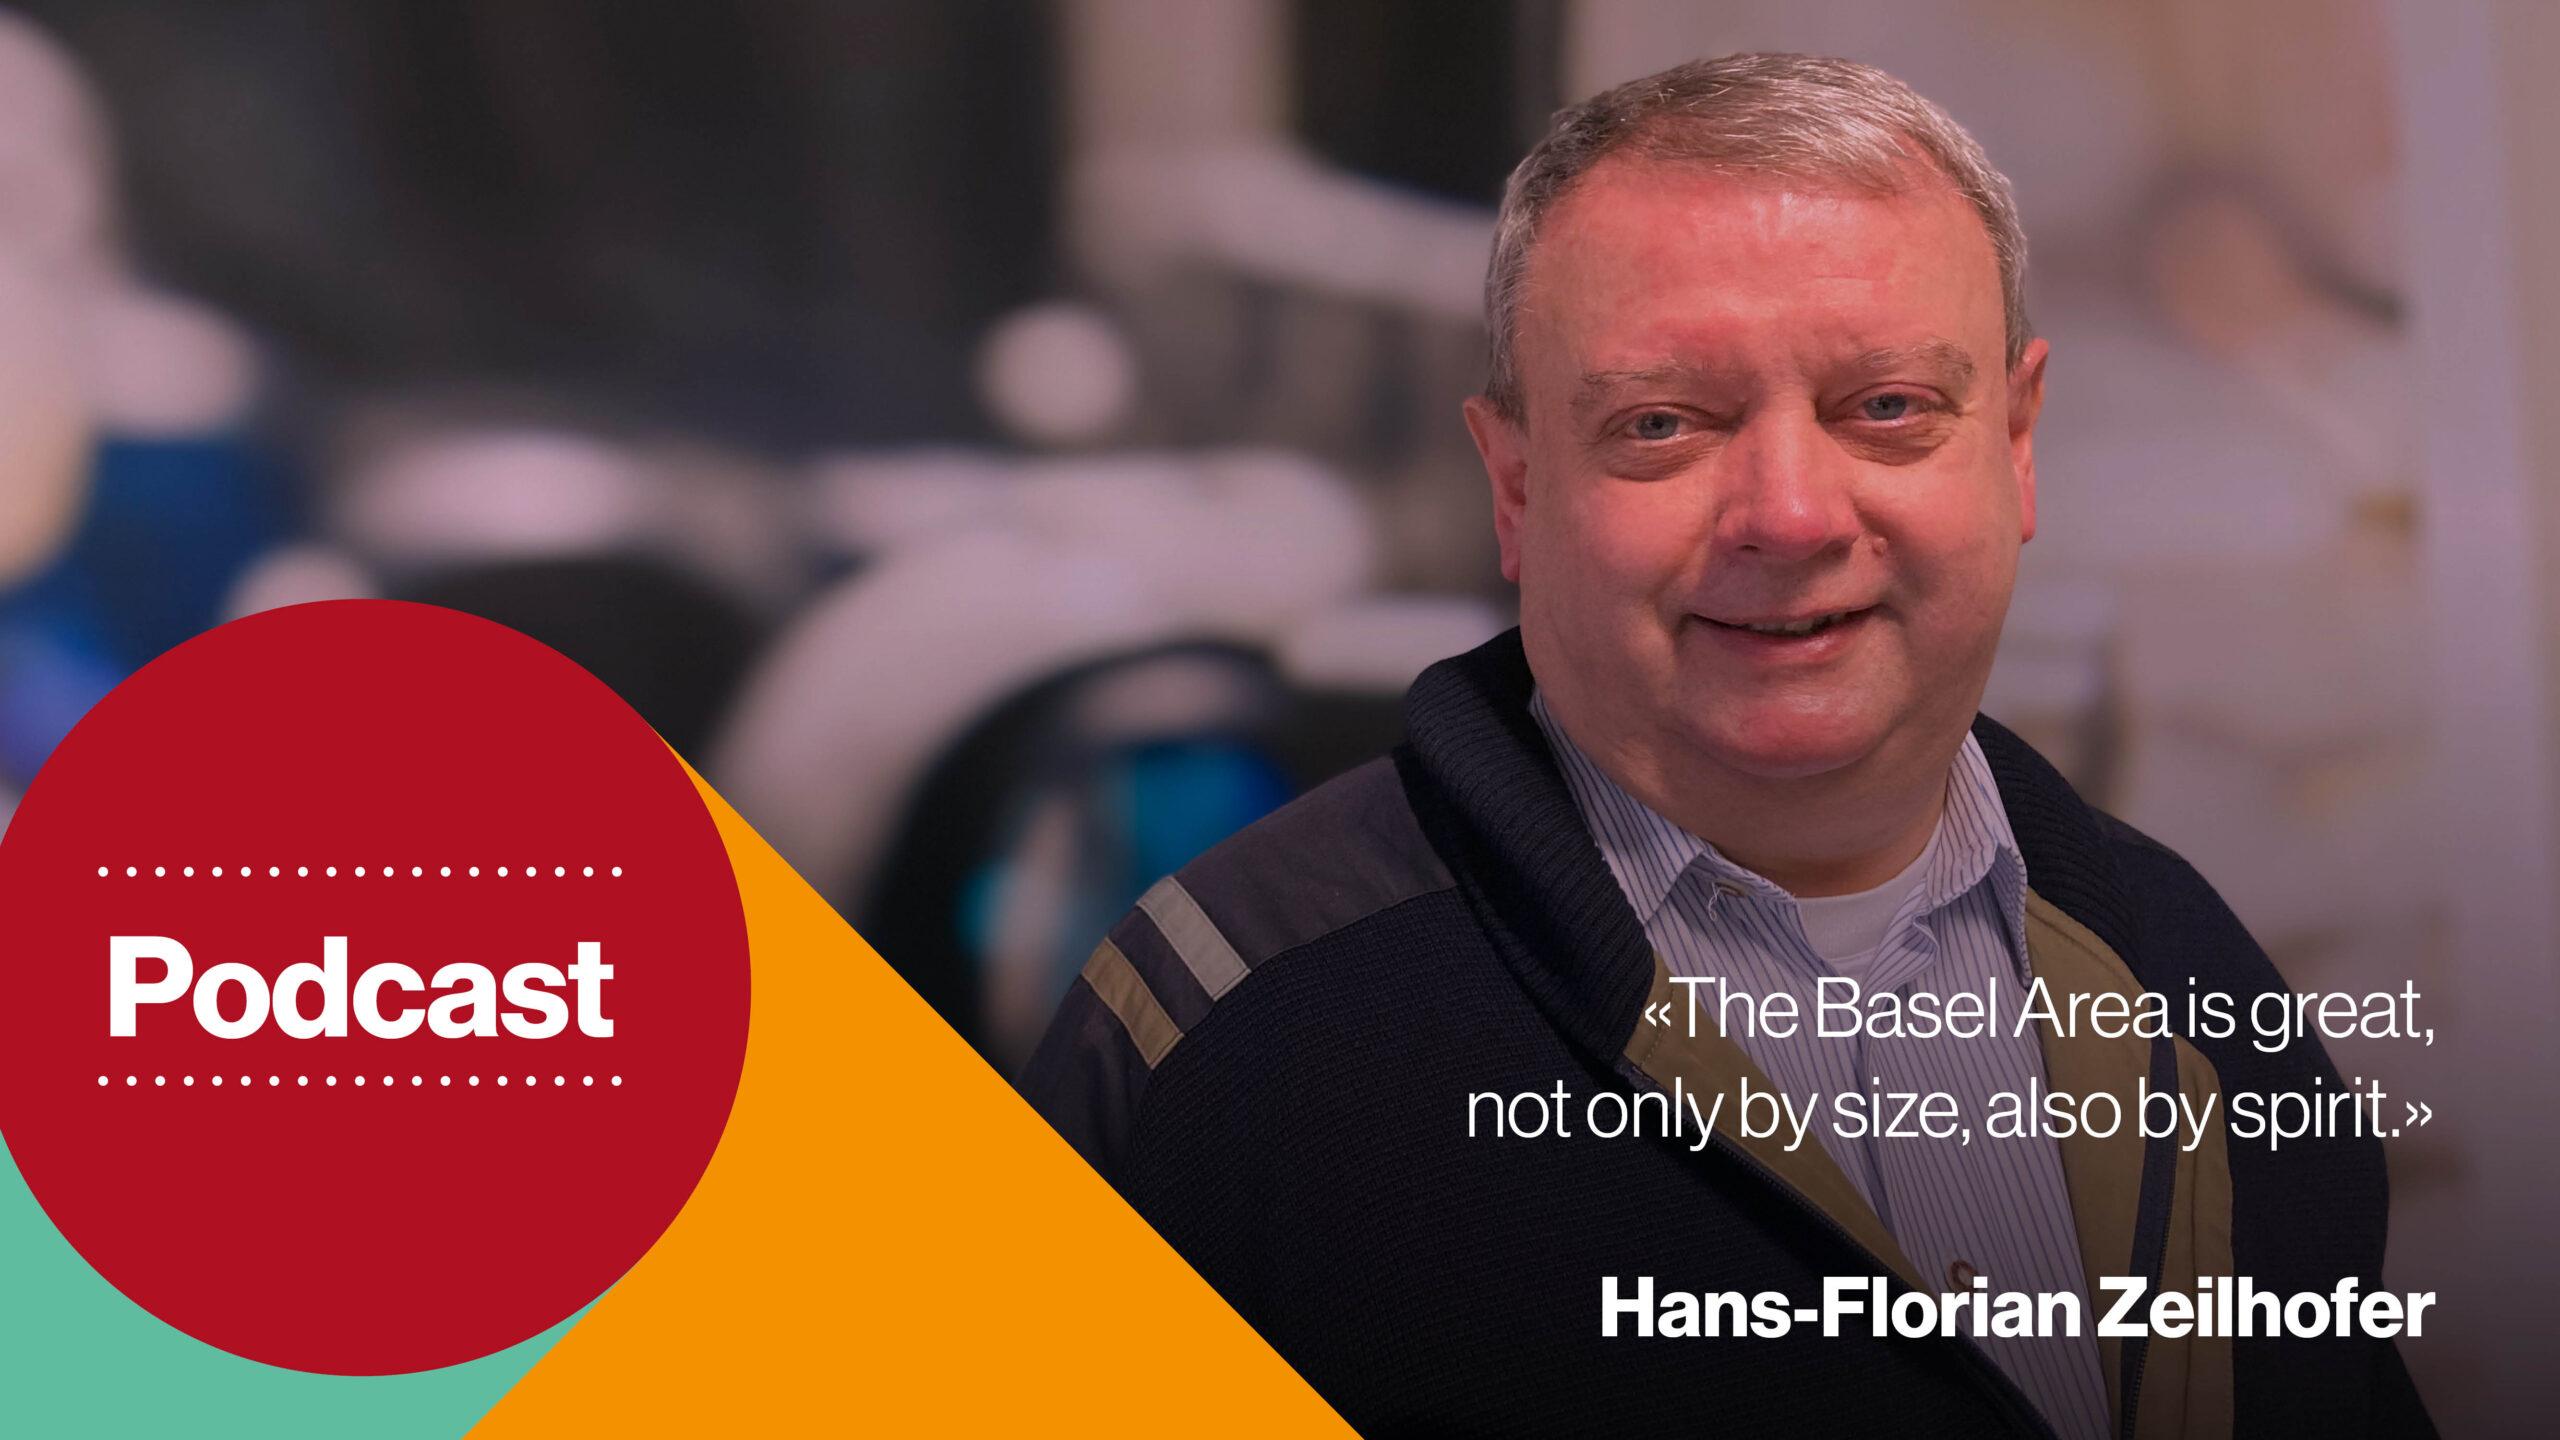 Podcast cover - Top researcher and entrepreneur: Hans-Florian Zeilhofer